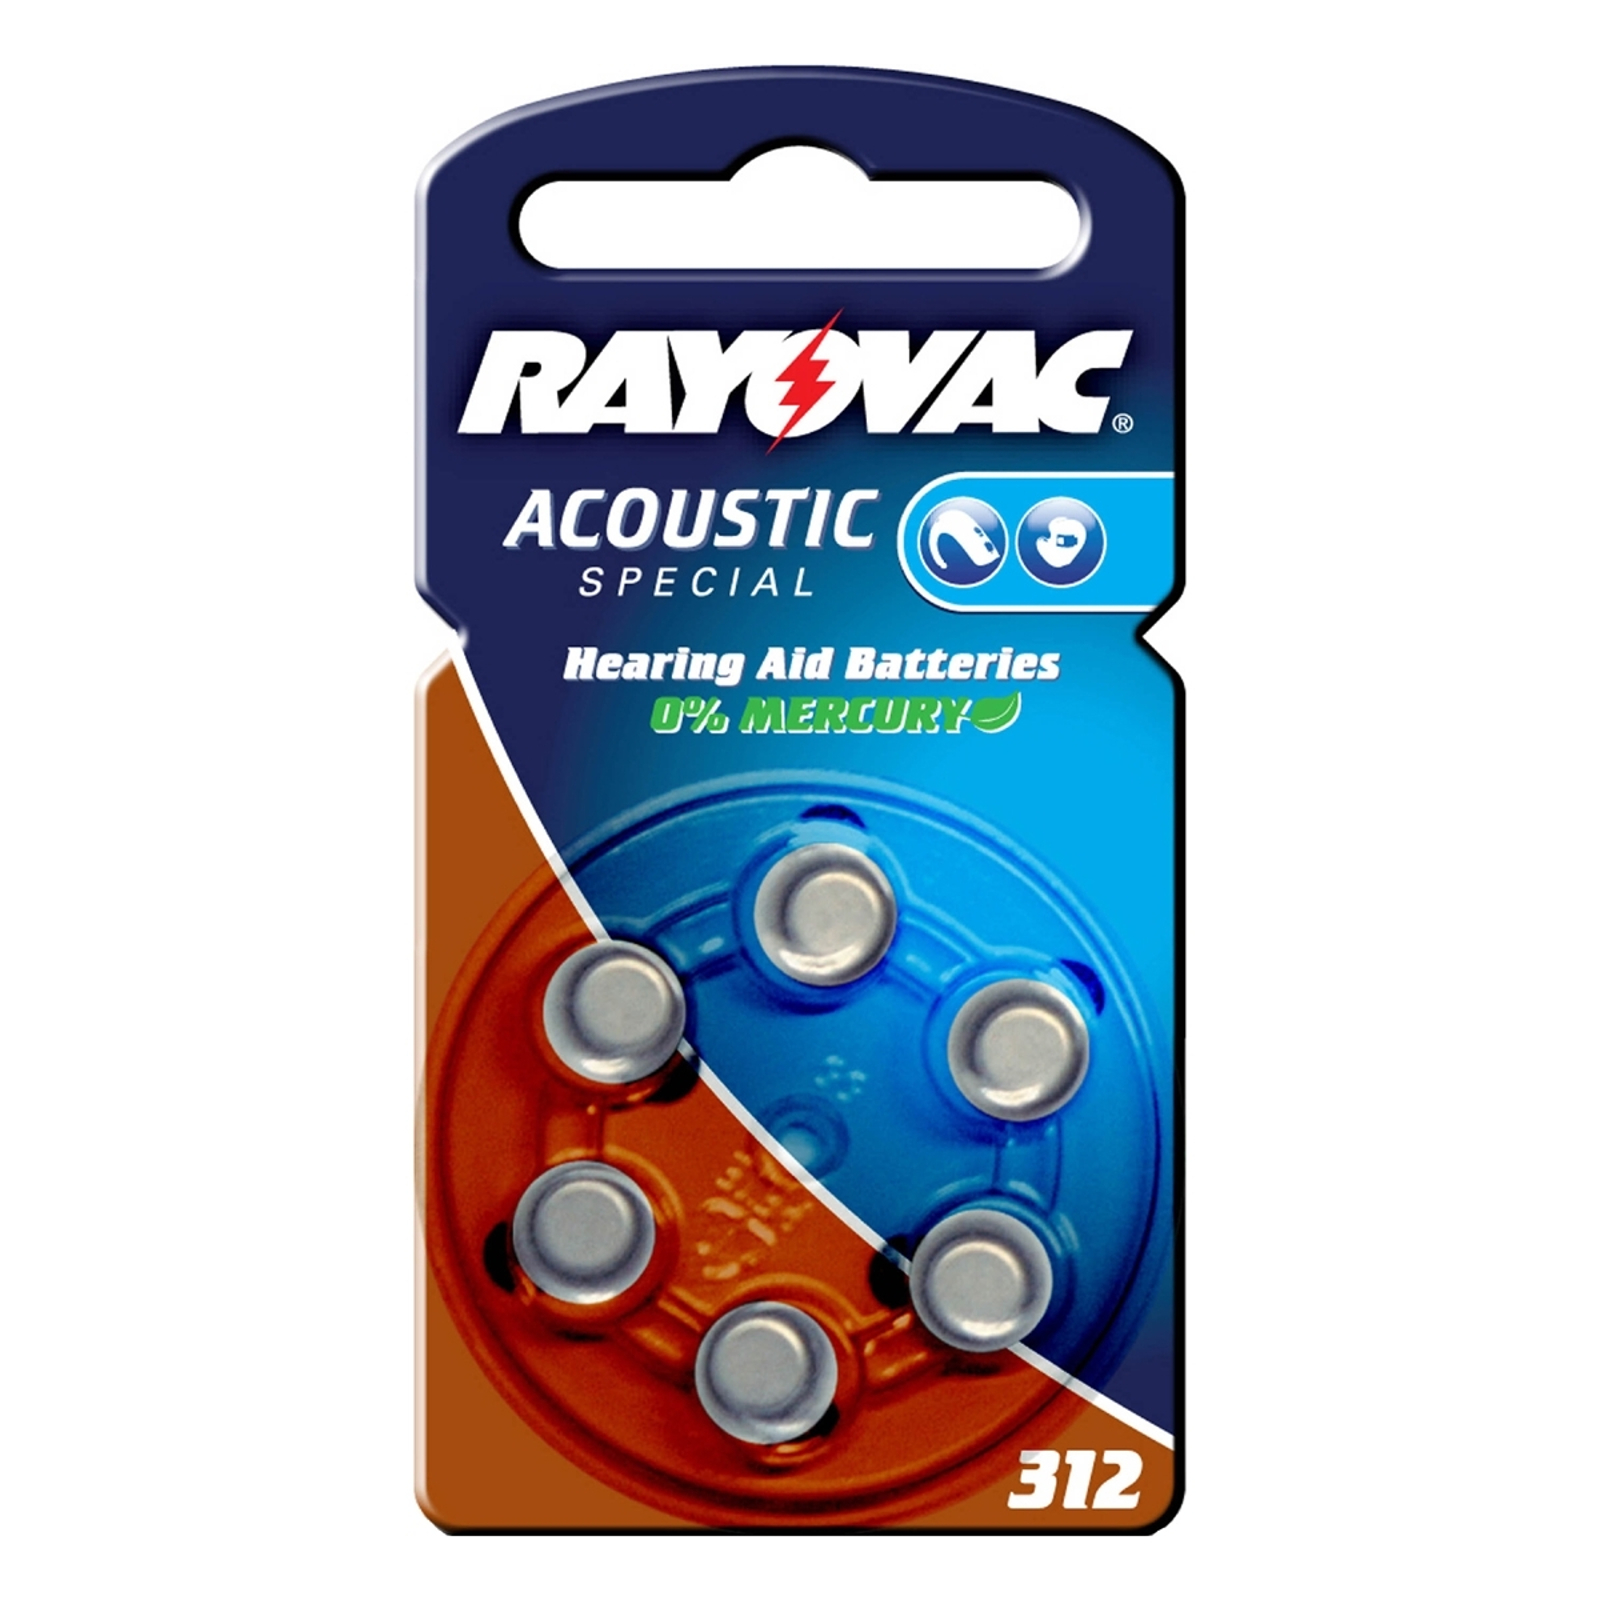 Knappbatteri Rayovac 312 Acoustic 1,4 V 180m/Ah